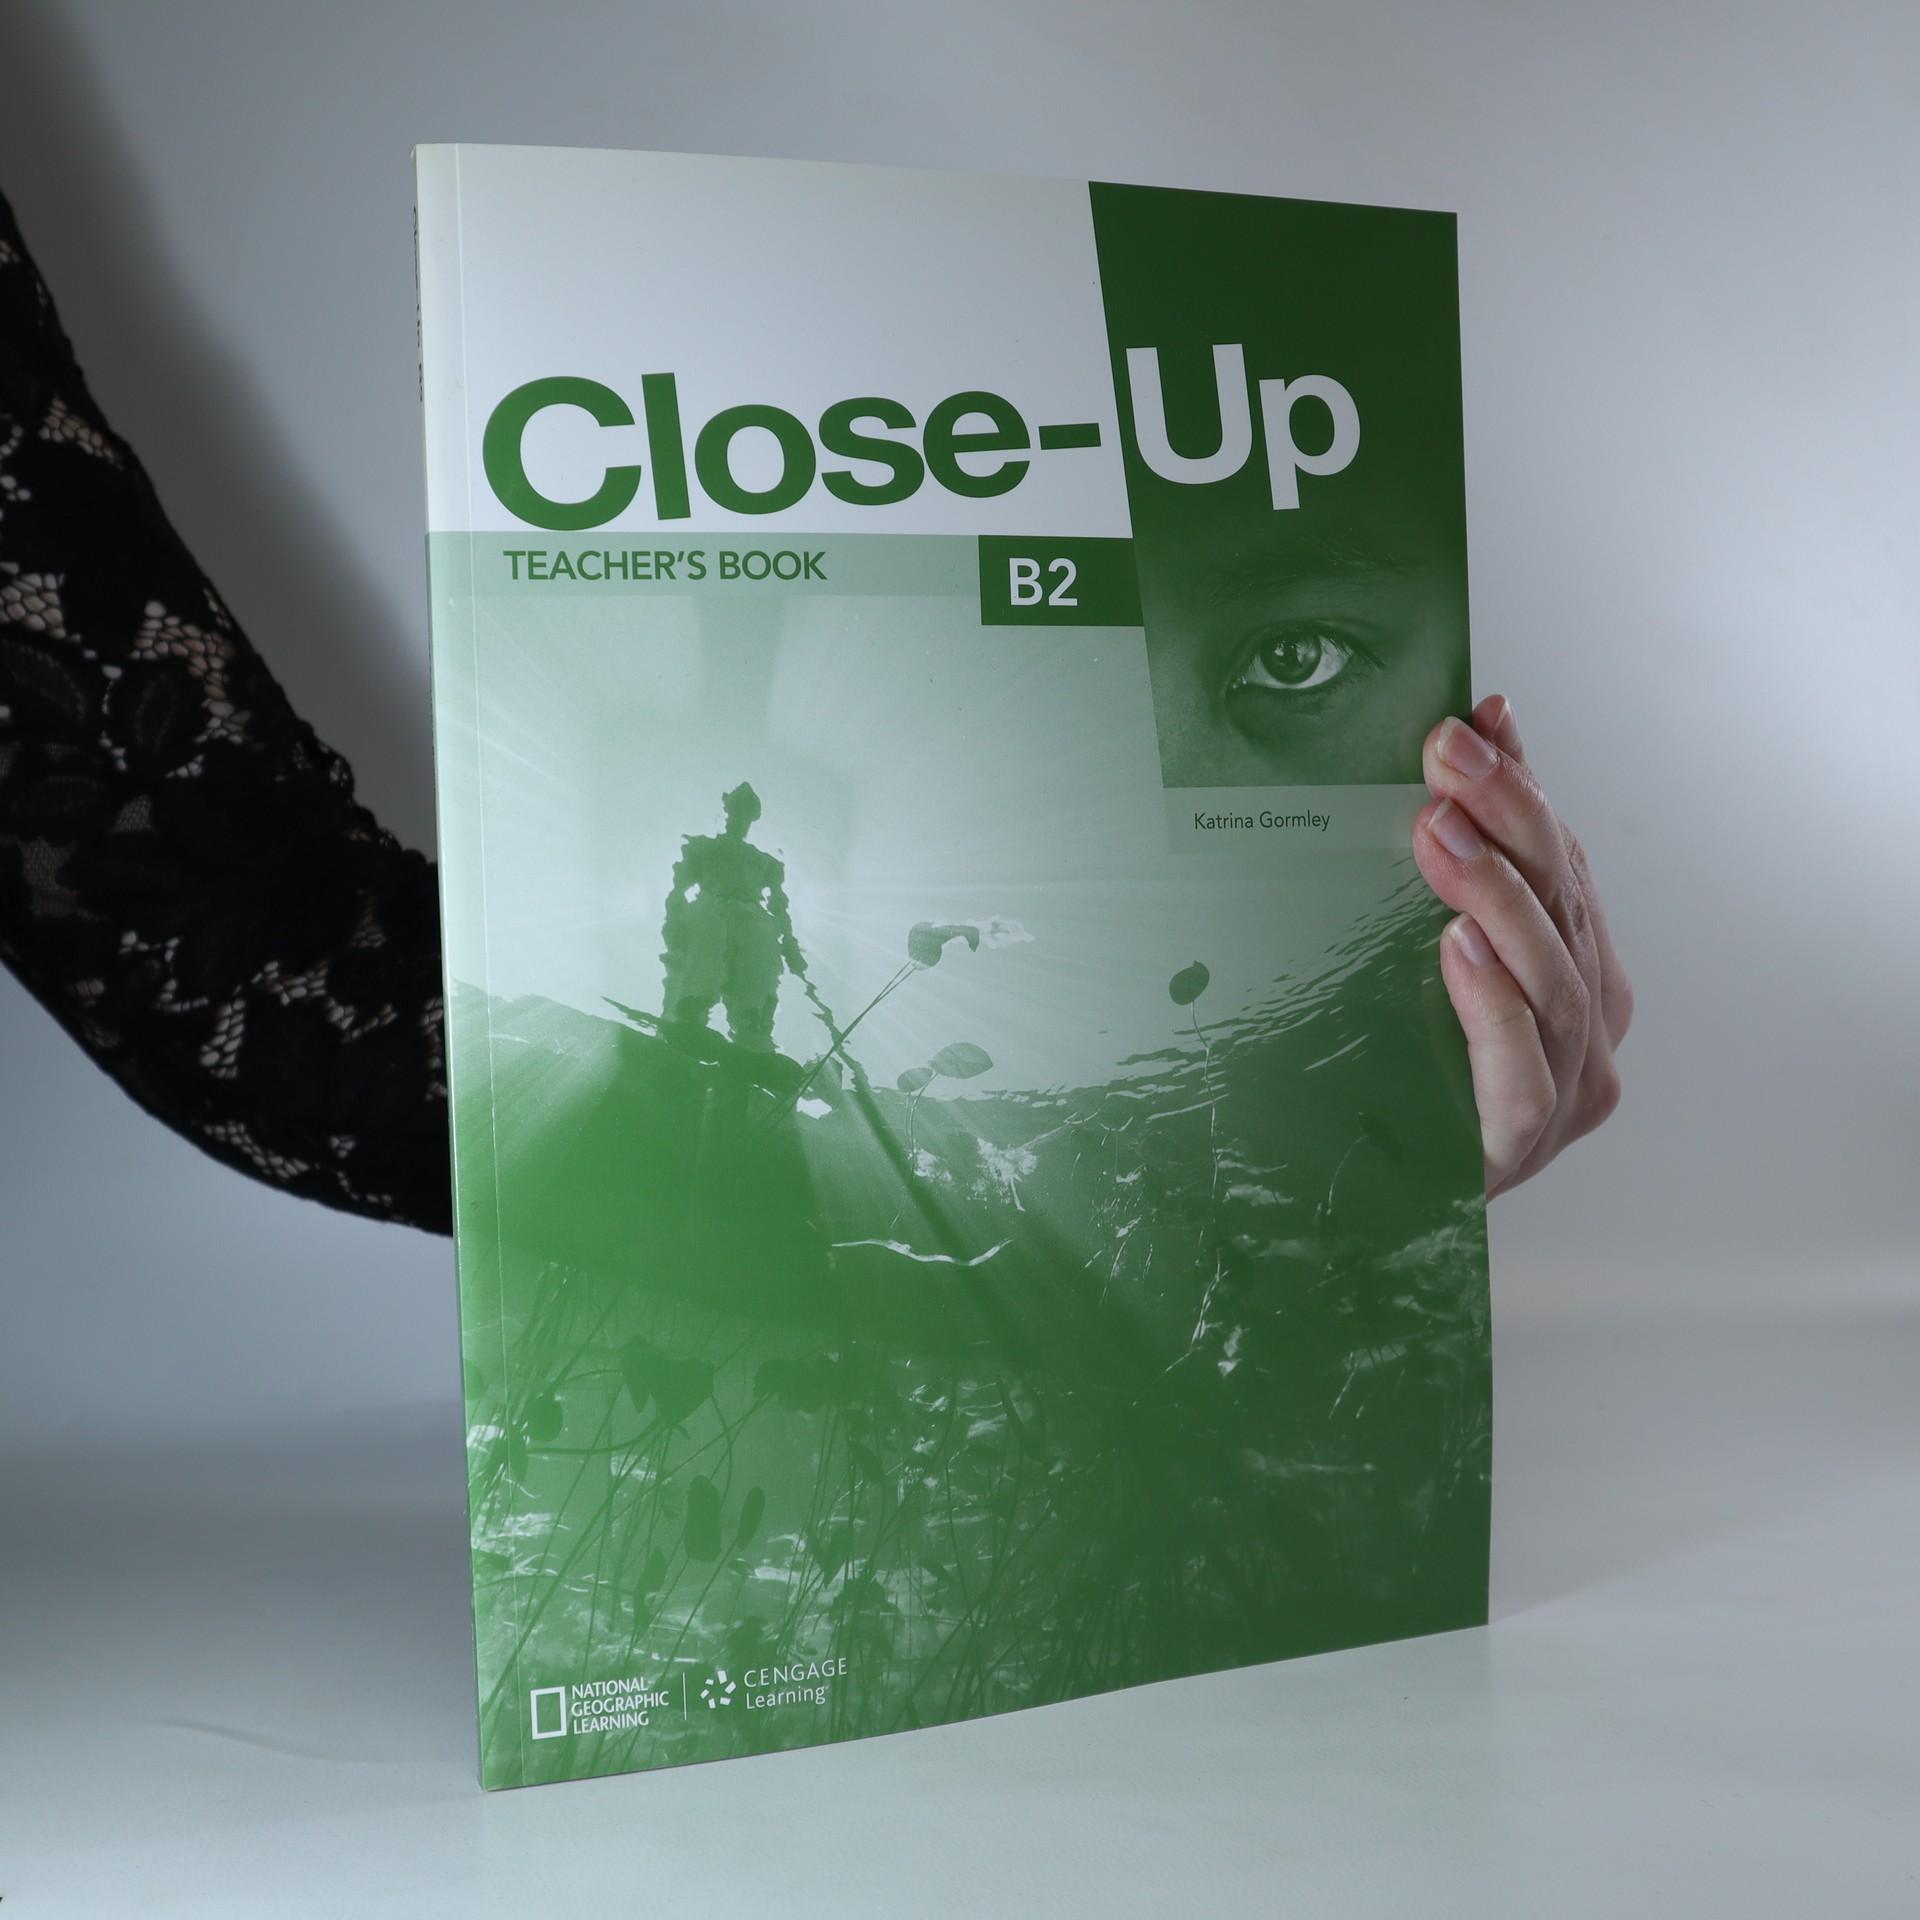 antikvární kniha Close-up 2. Teacher's Book, neuveden